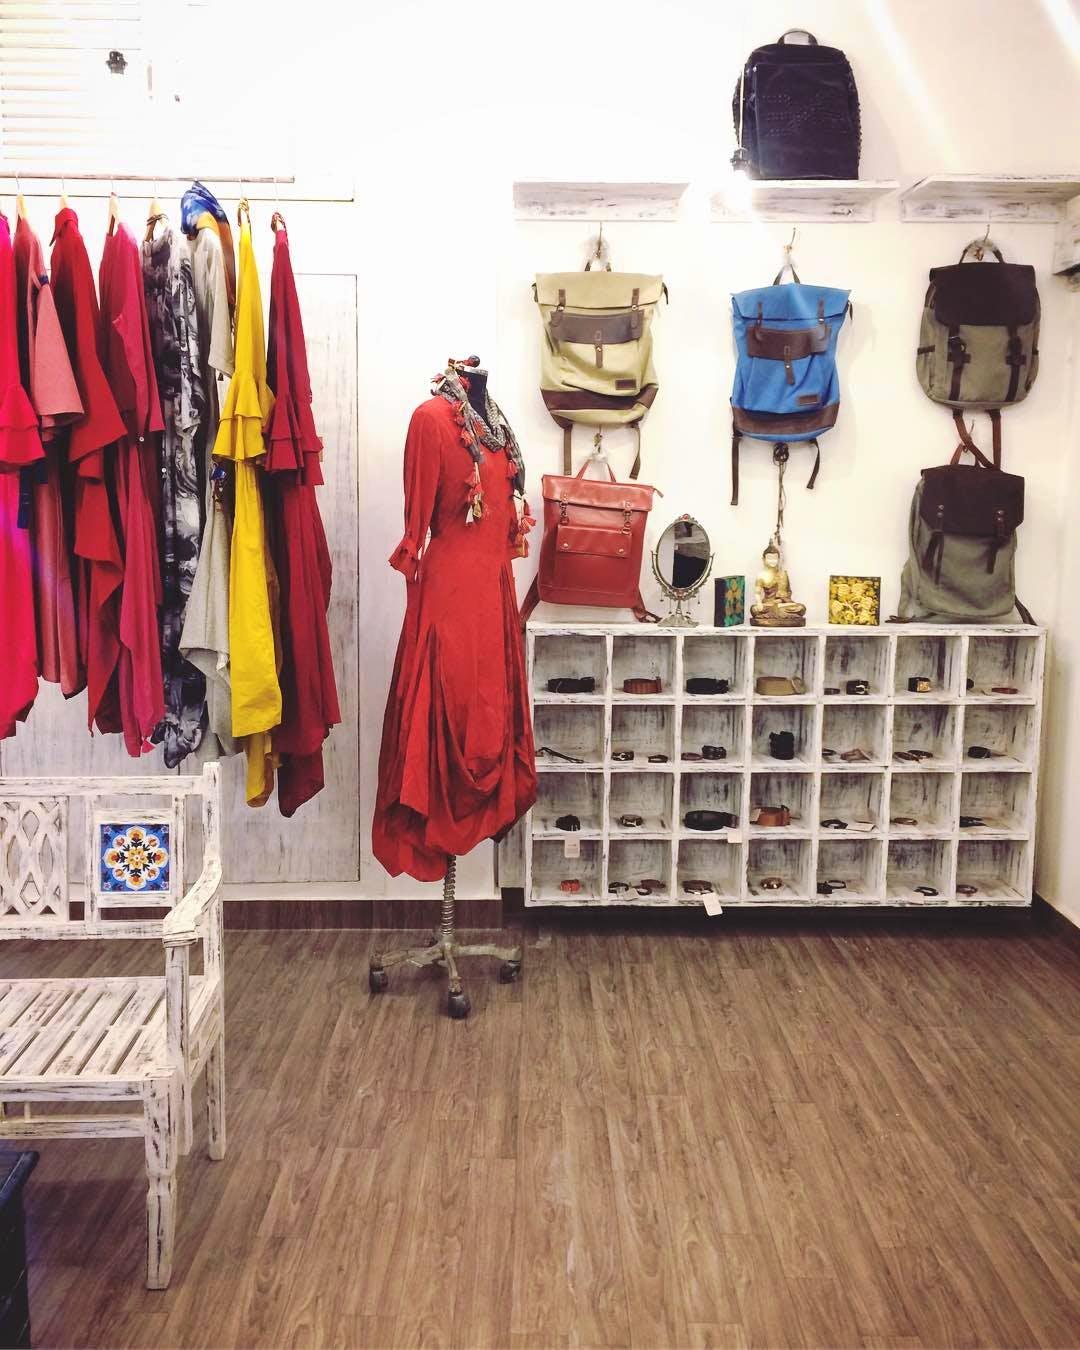 Room,Boutique,Clothes hanger,Fashion,Fashion design,Floor,Outerwear,Costume design,Flooring,Furniture